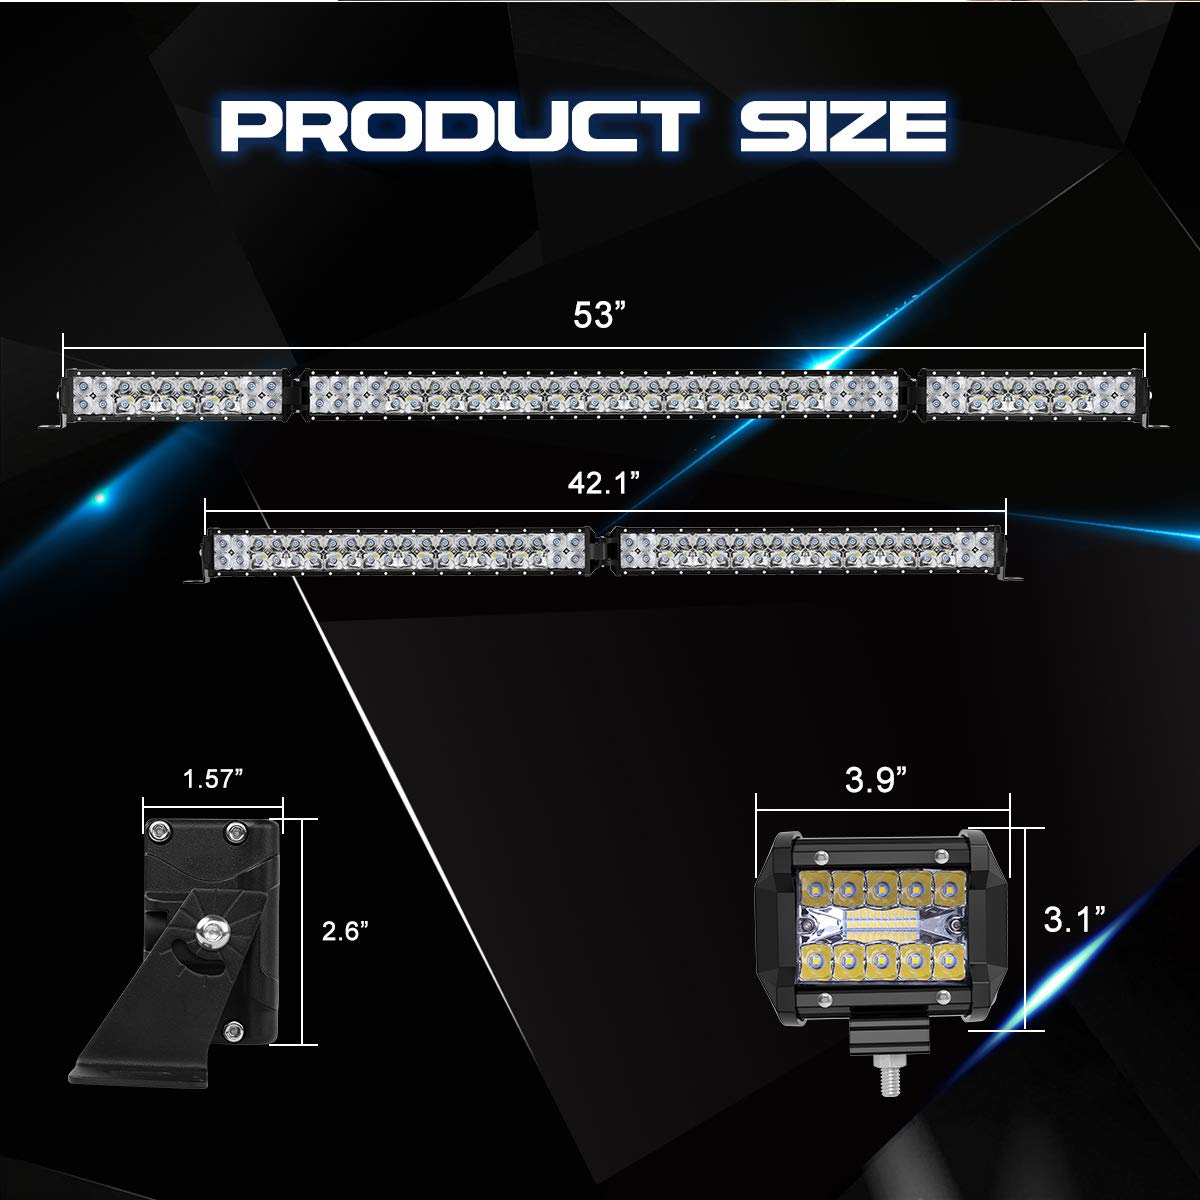 LED Light Bar Kit 4PCS 4 30W LED Light Pods Fit For Jeep Truck ATV Rigidhorse 76000LM 42 Inch 400W 3 Years Warranty 22 Inch 220W Flood Spot Beam Combo White LED Light Bars